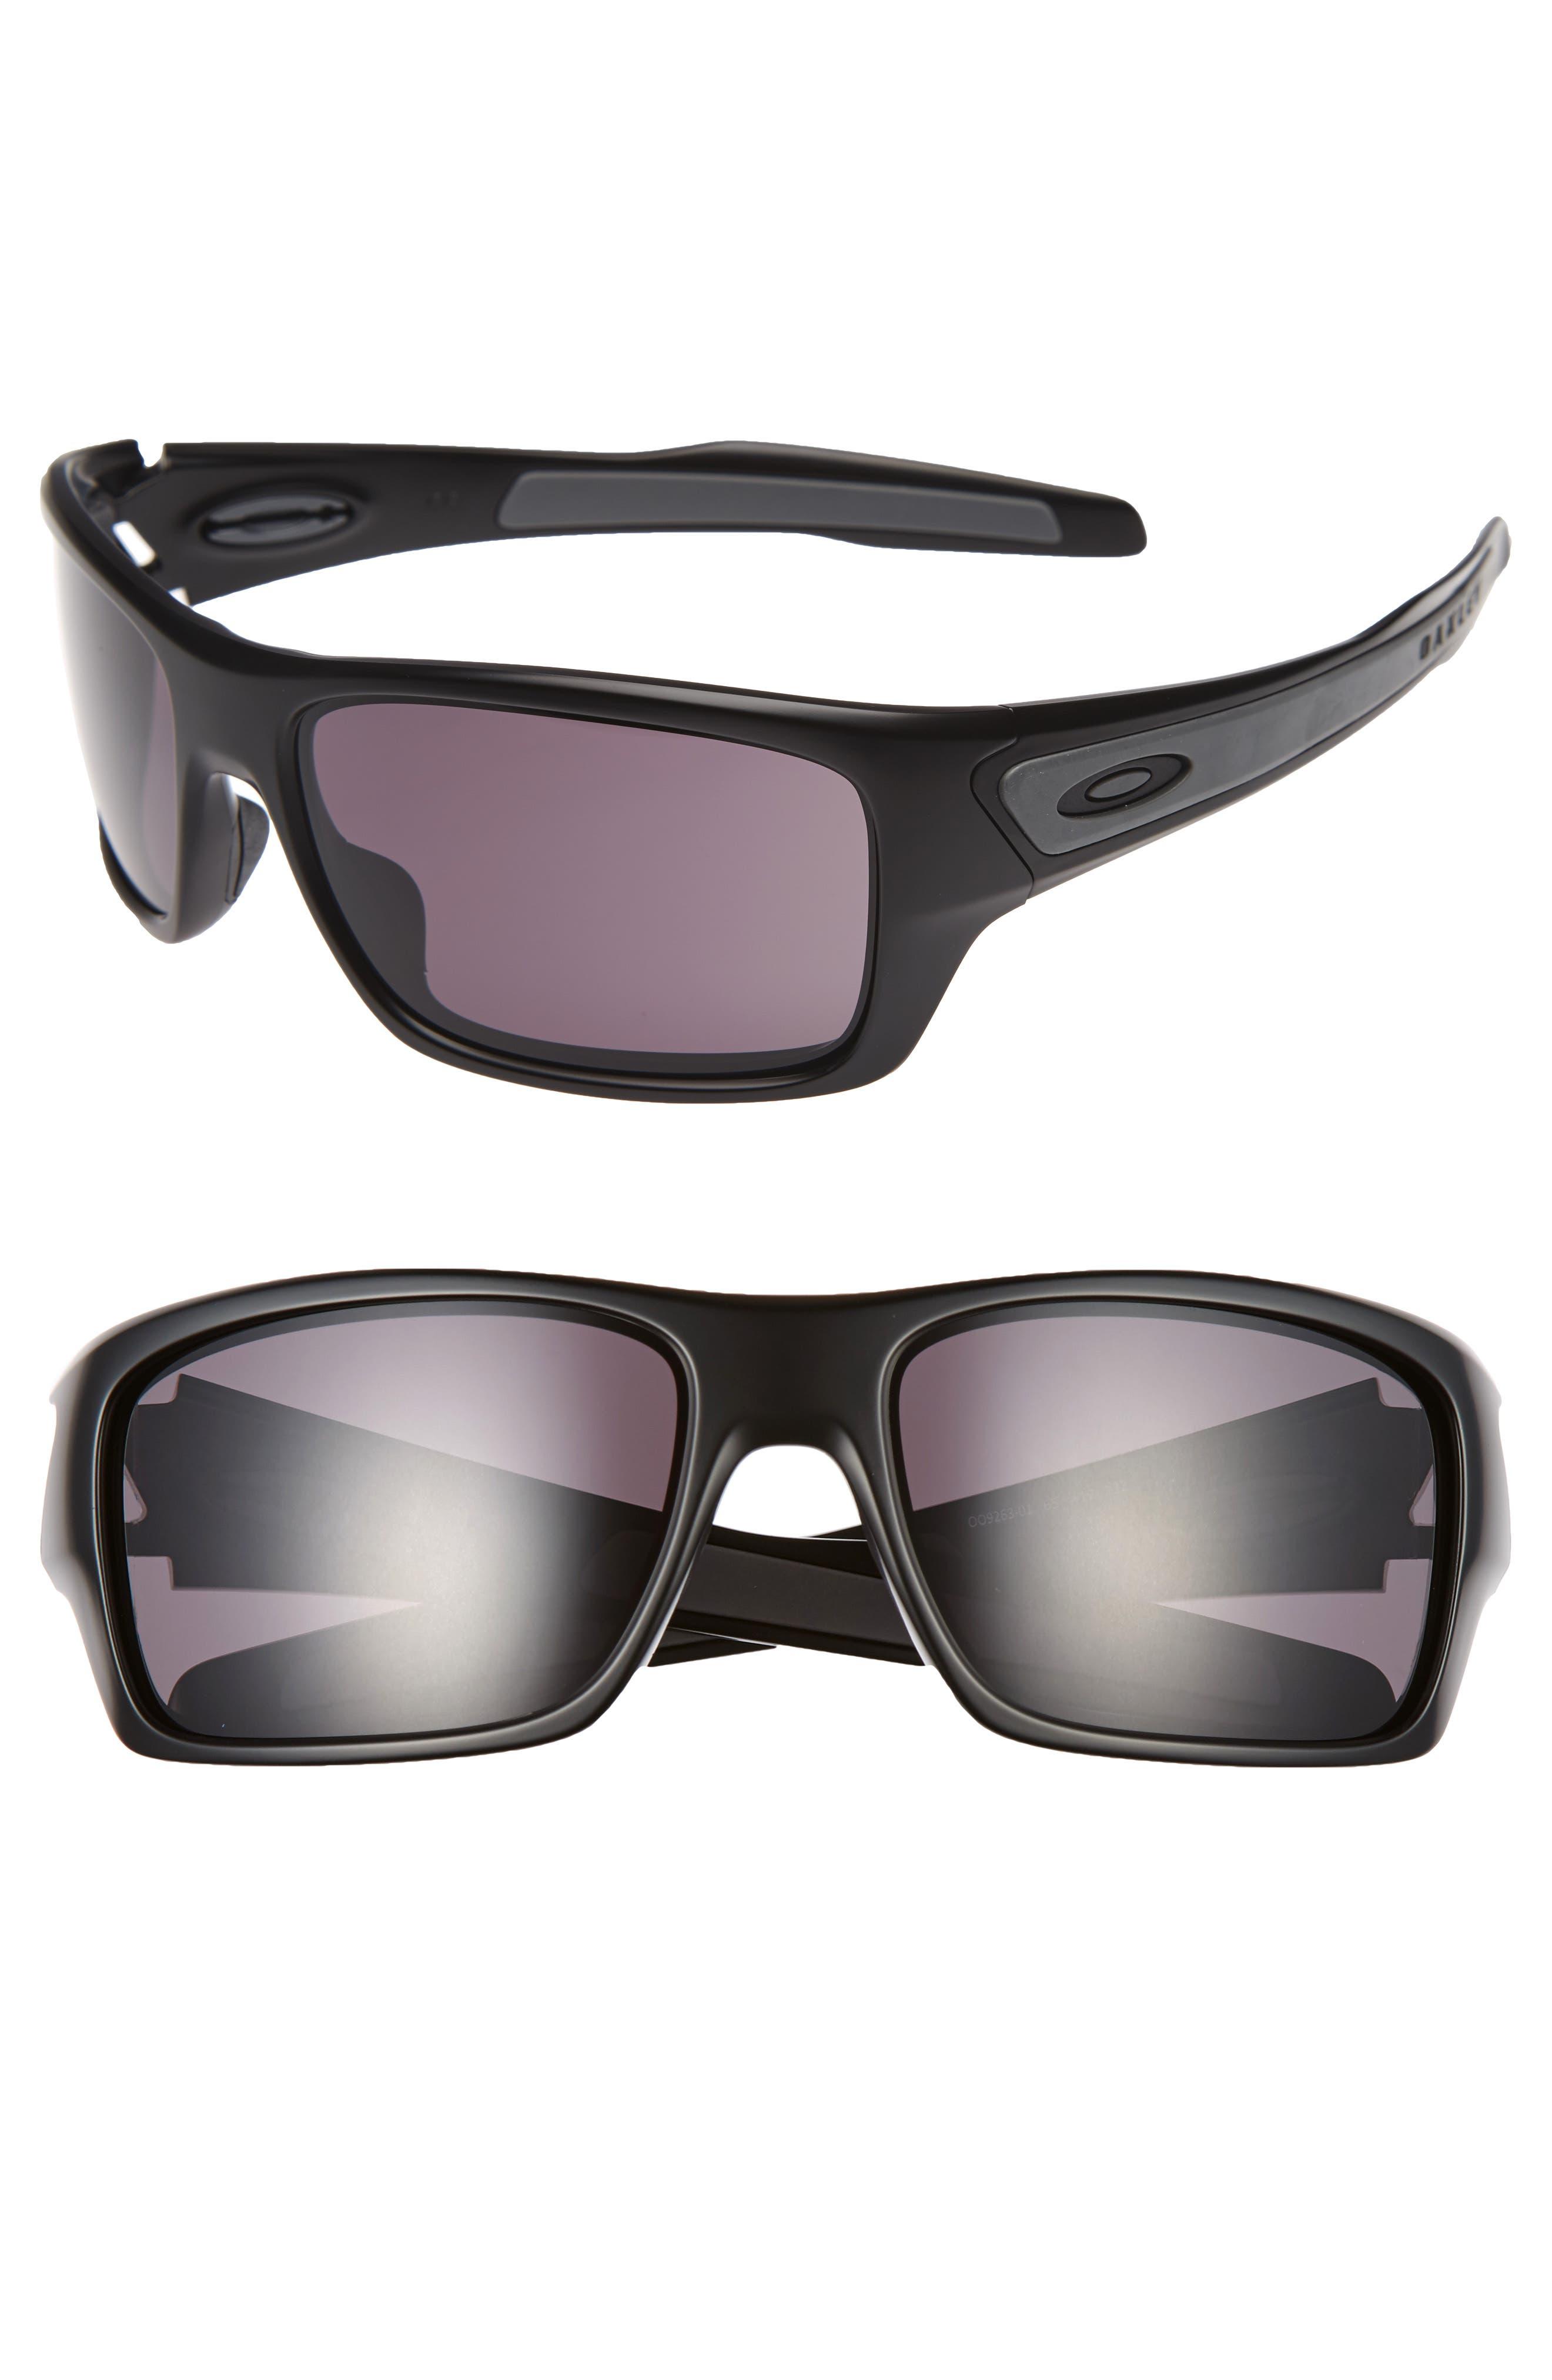 Oakley Turbine 65Mm Sunglasses -